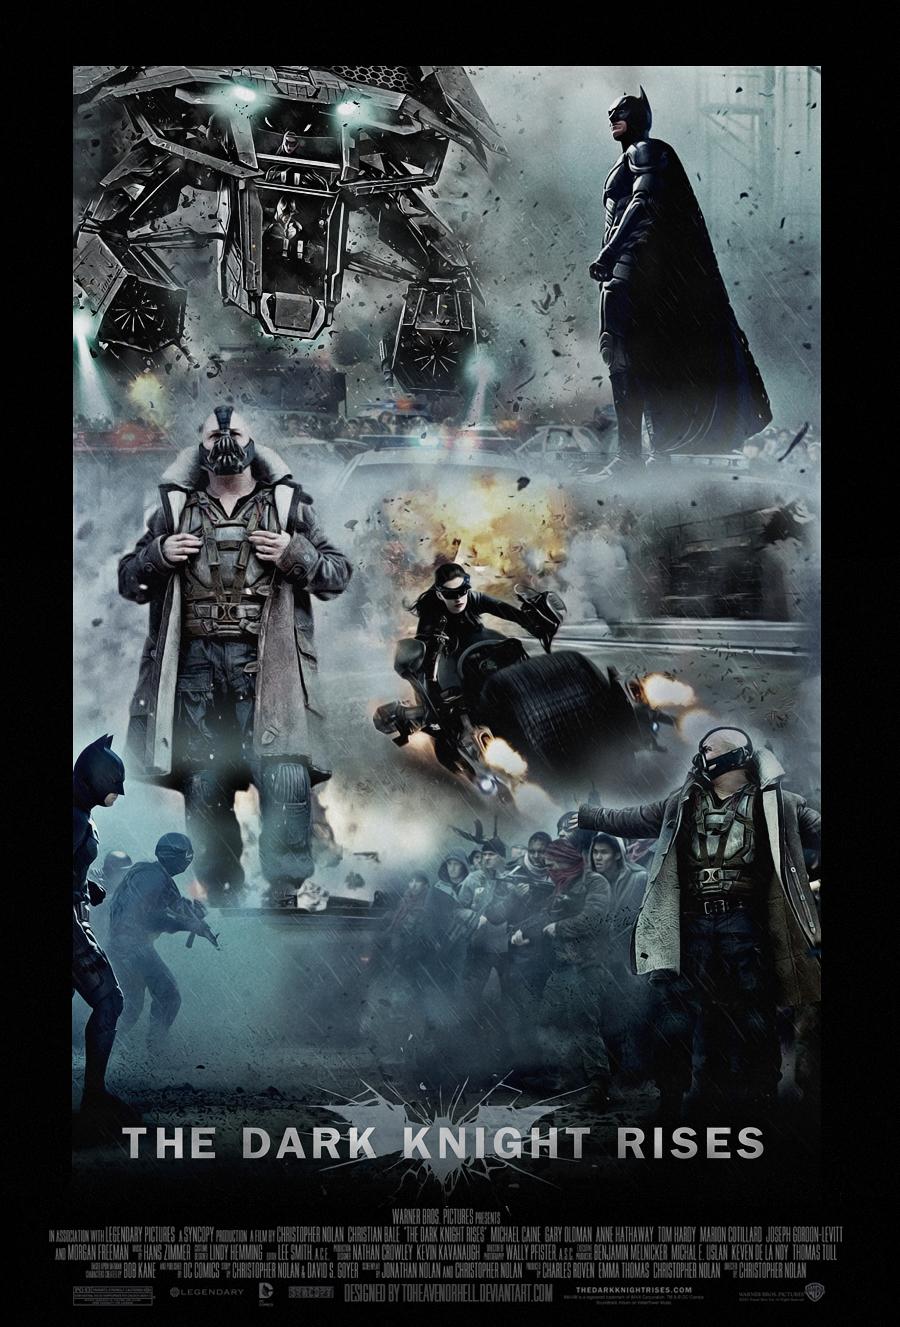 The Dark Knight Rises Movie Poster by ToHeavenOrHell